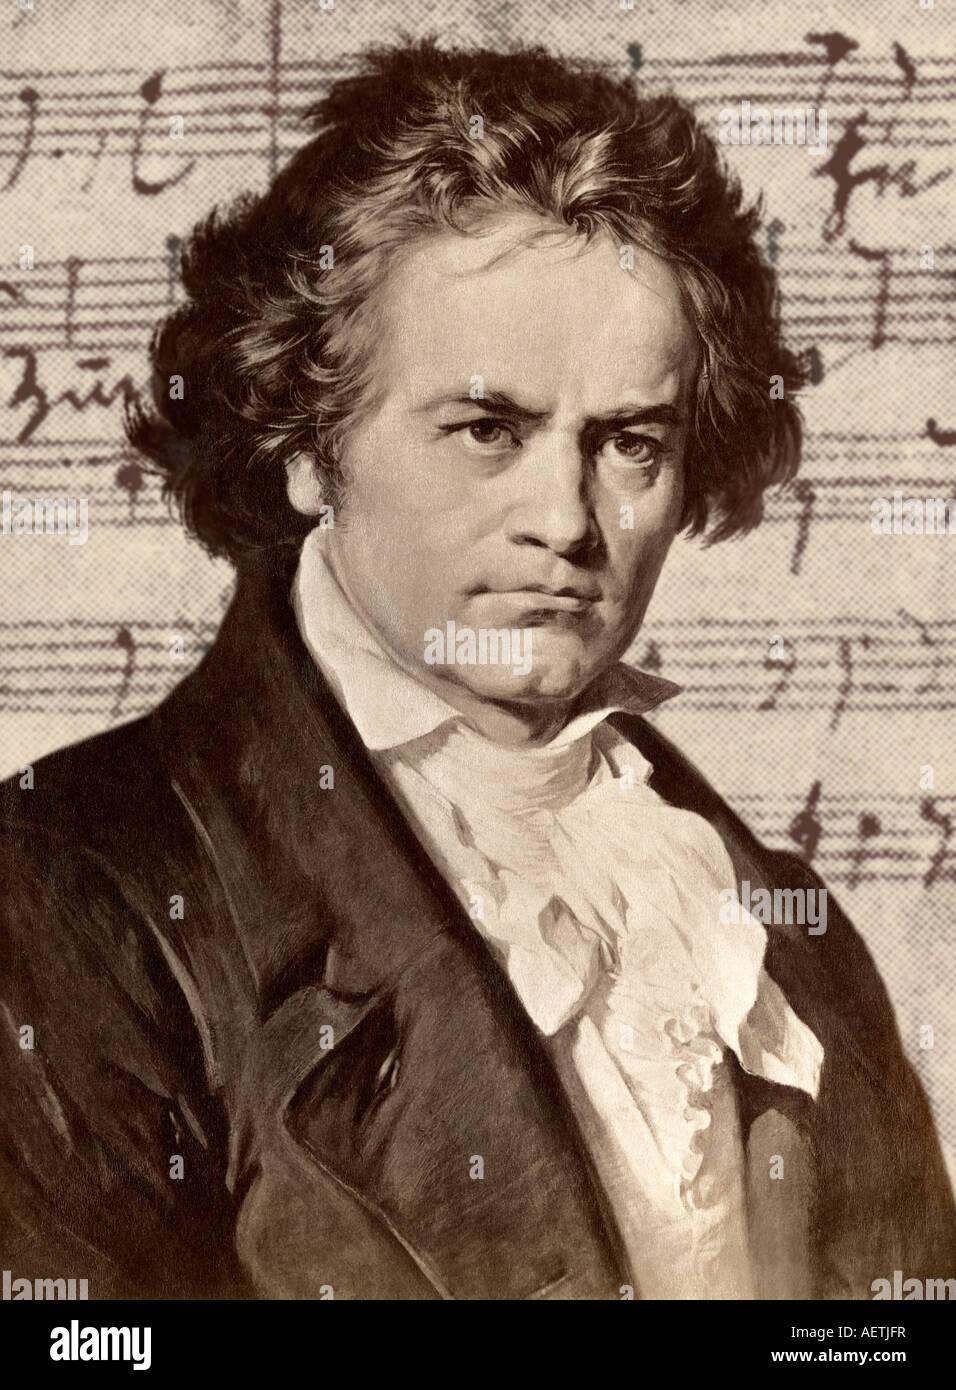 Ludwig van Beethoven. Illustration - Stock Image